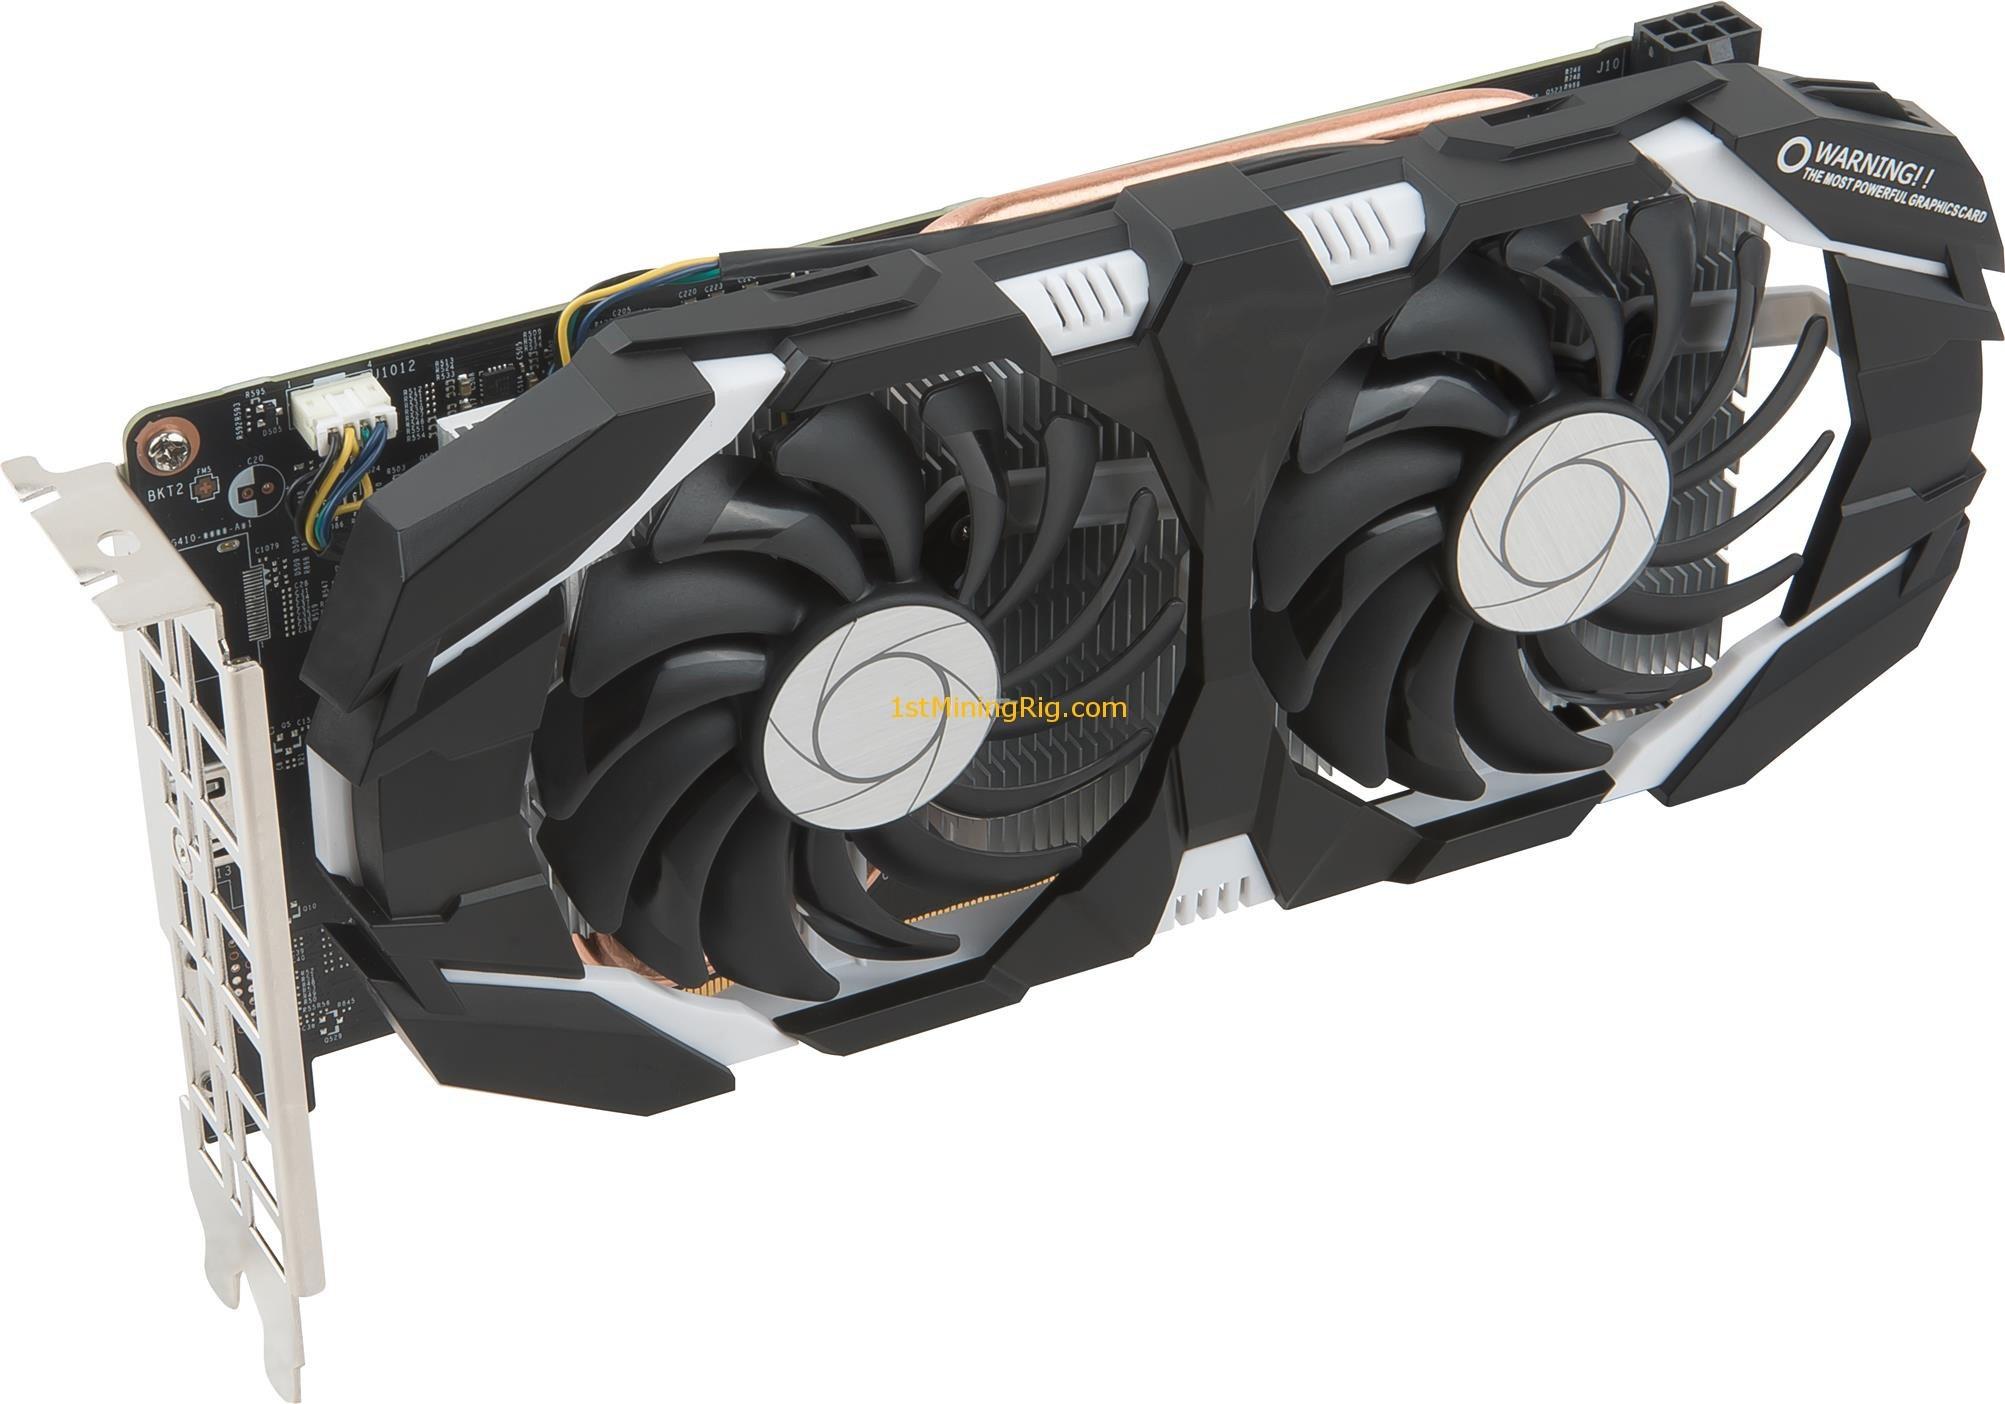 Nvidia-P106-100-6Gb-Mining-GPU